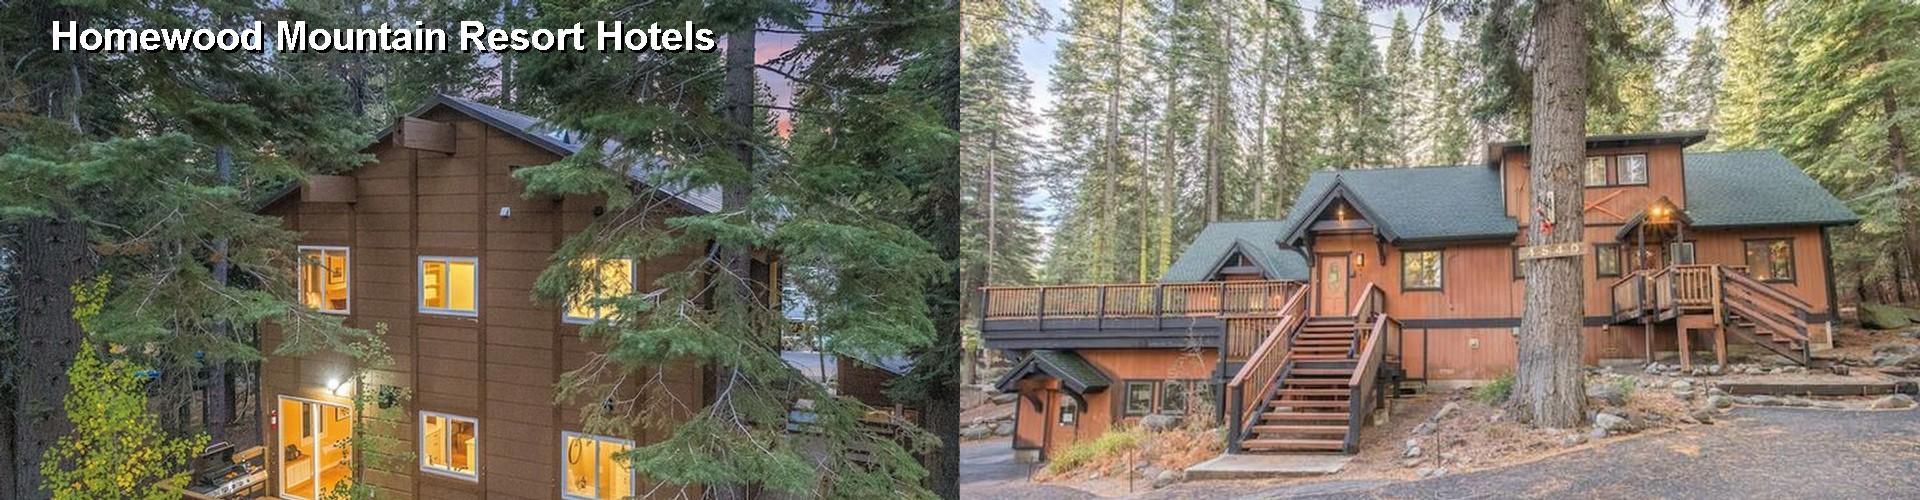 5 Best Hotels Near Homewood Mountain Resort